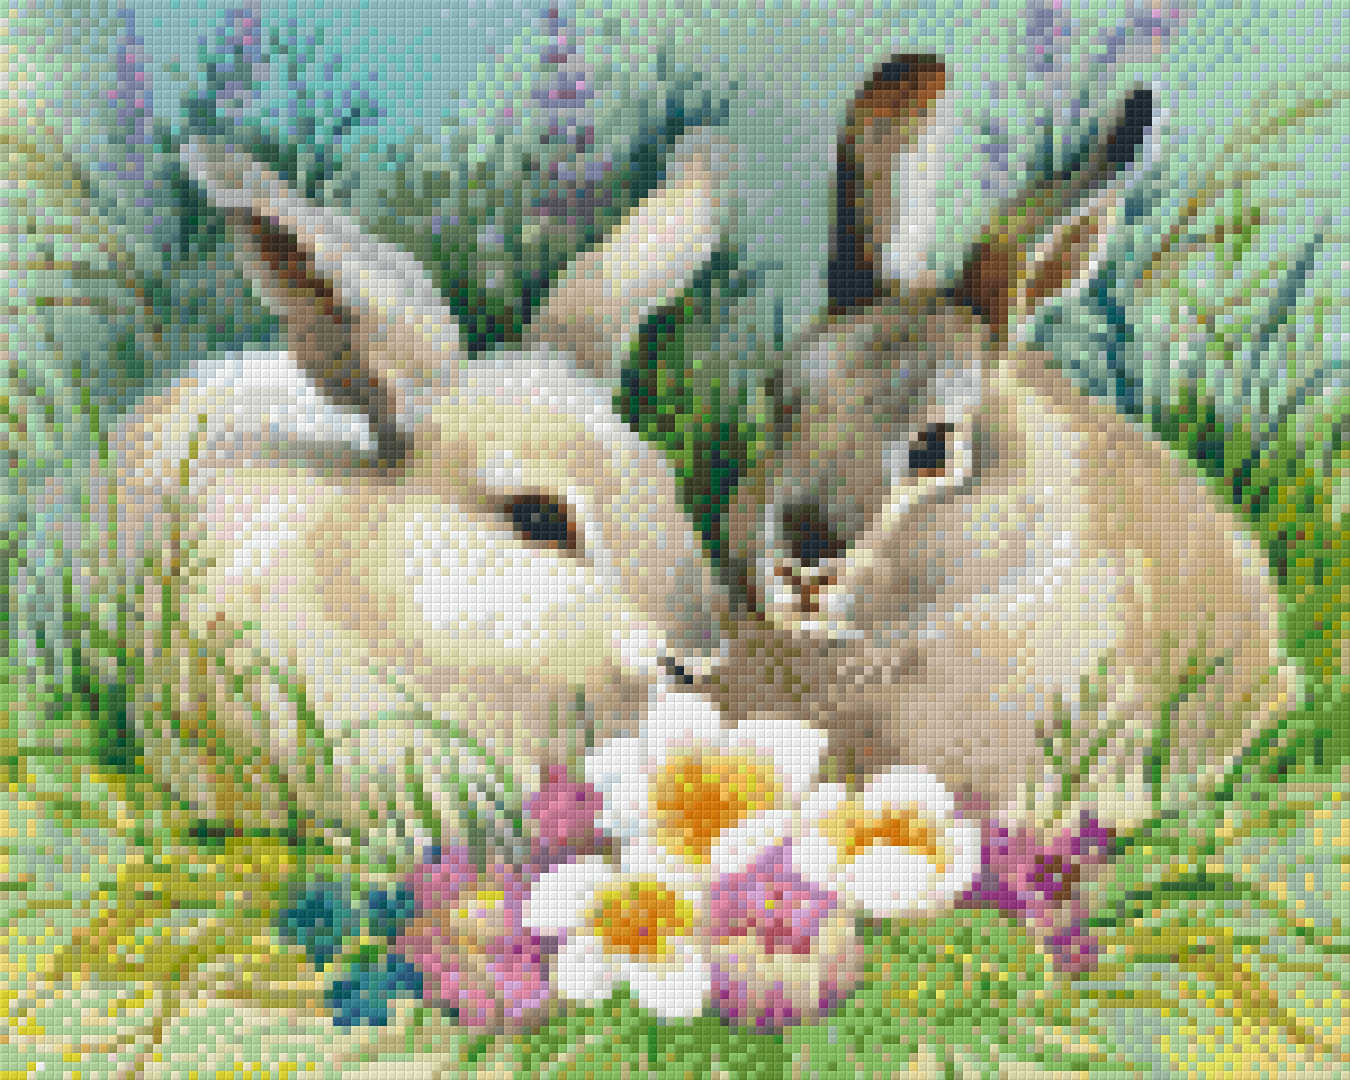 809_Rabbit -spring.phd.jpg